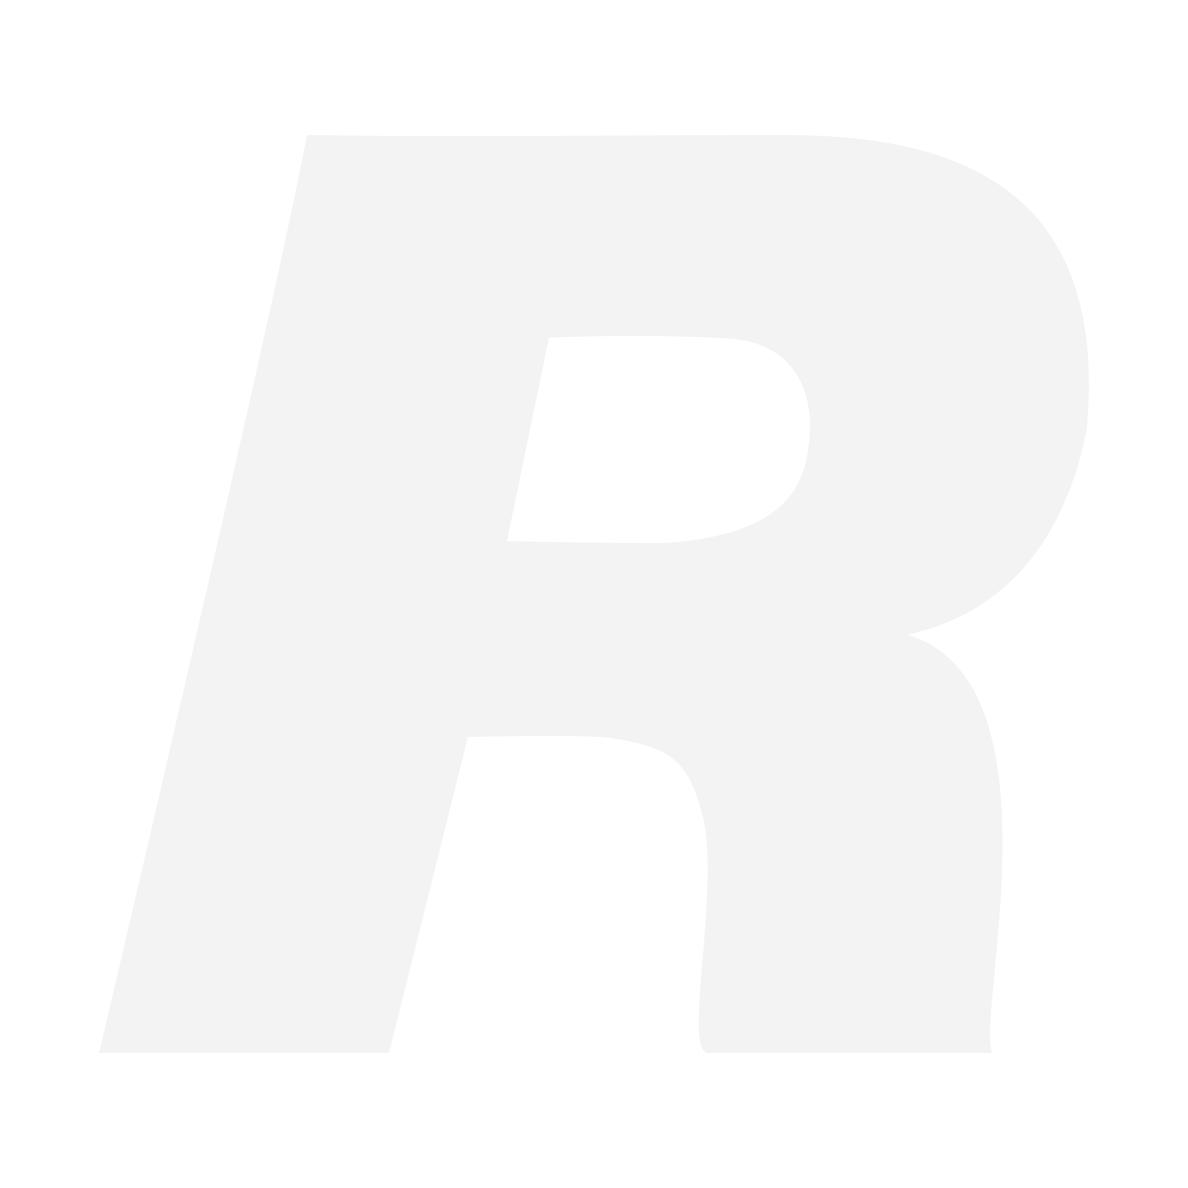 DJI Care Refresh (Phantom 4Pro, 4Pro+)